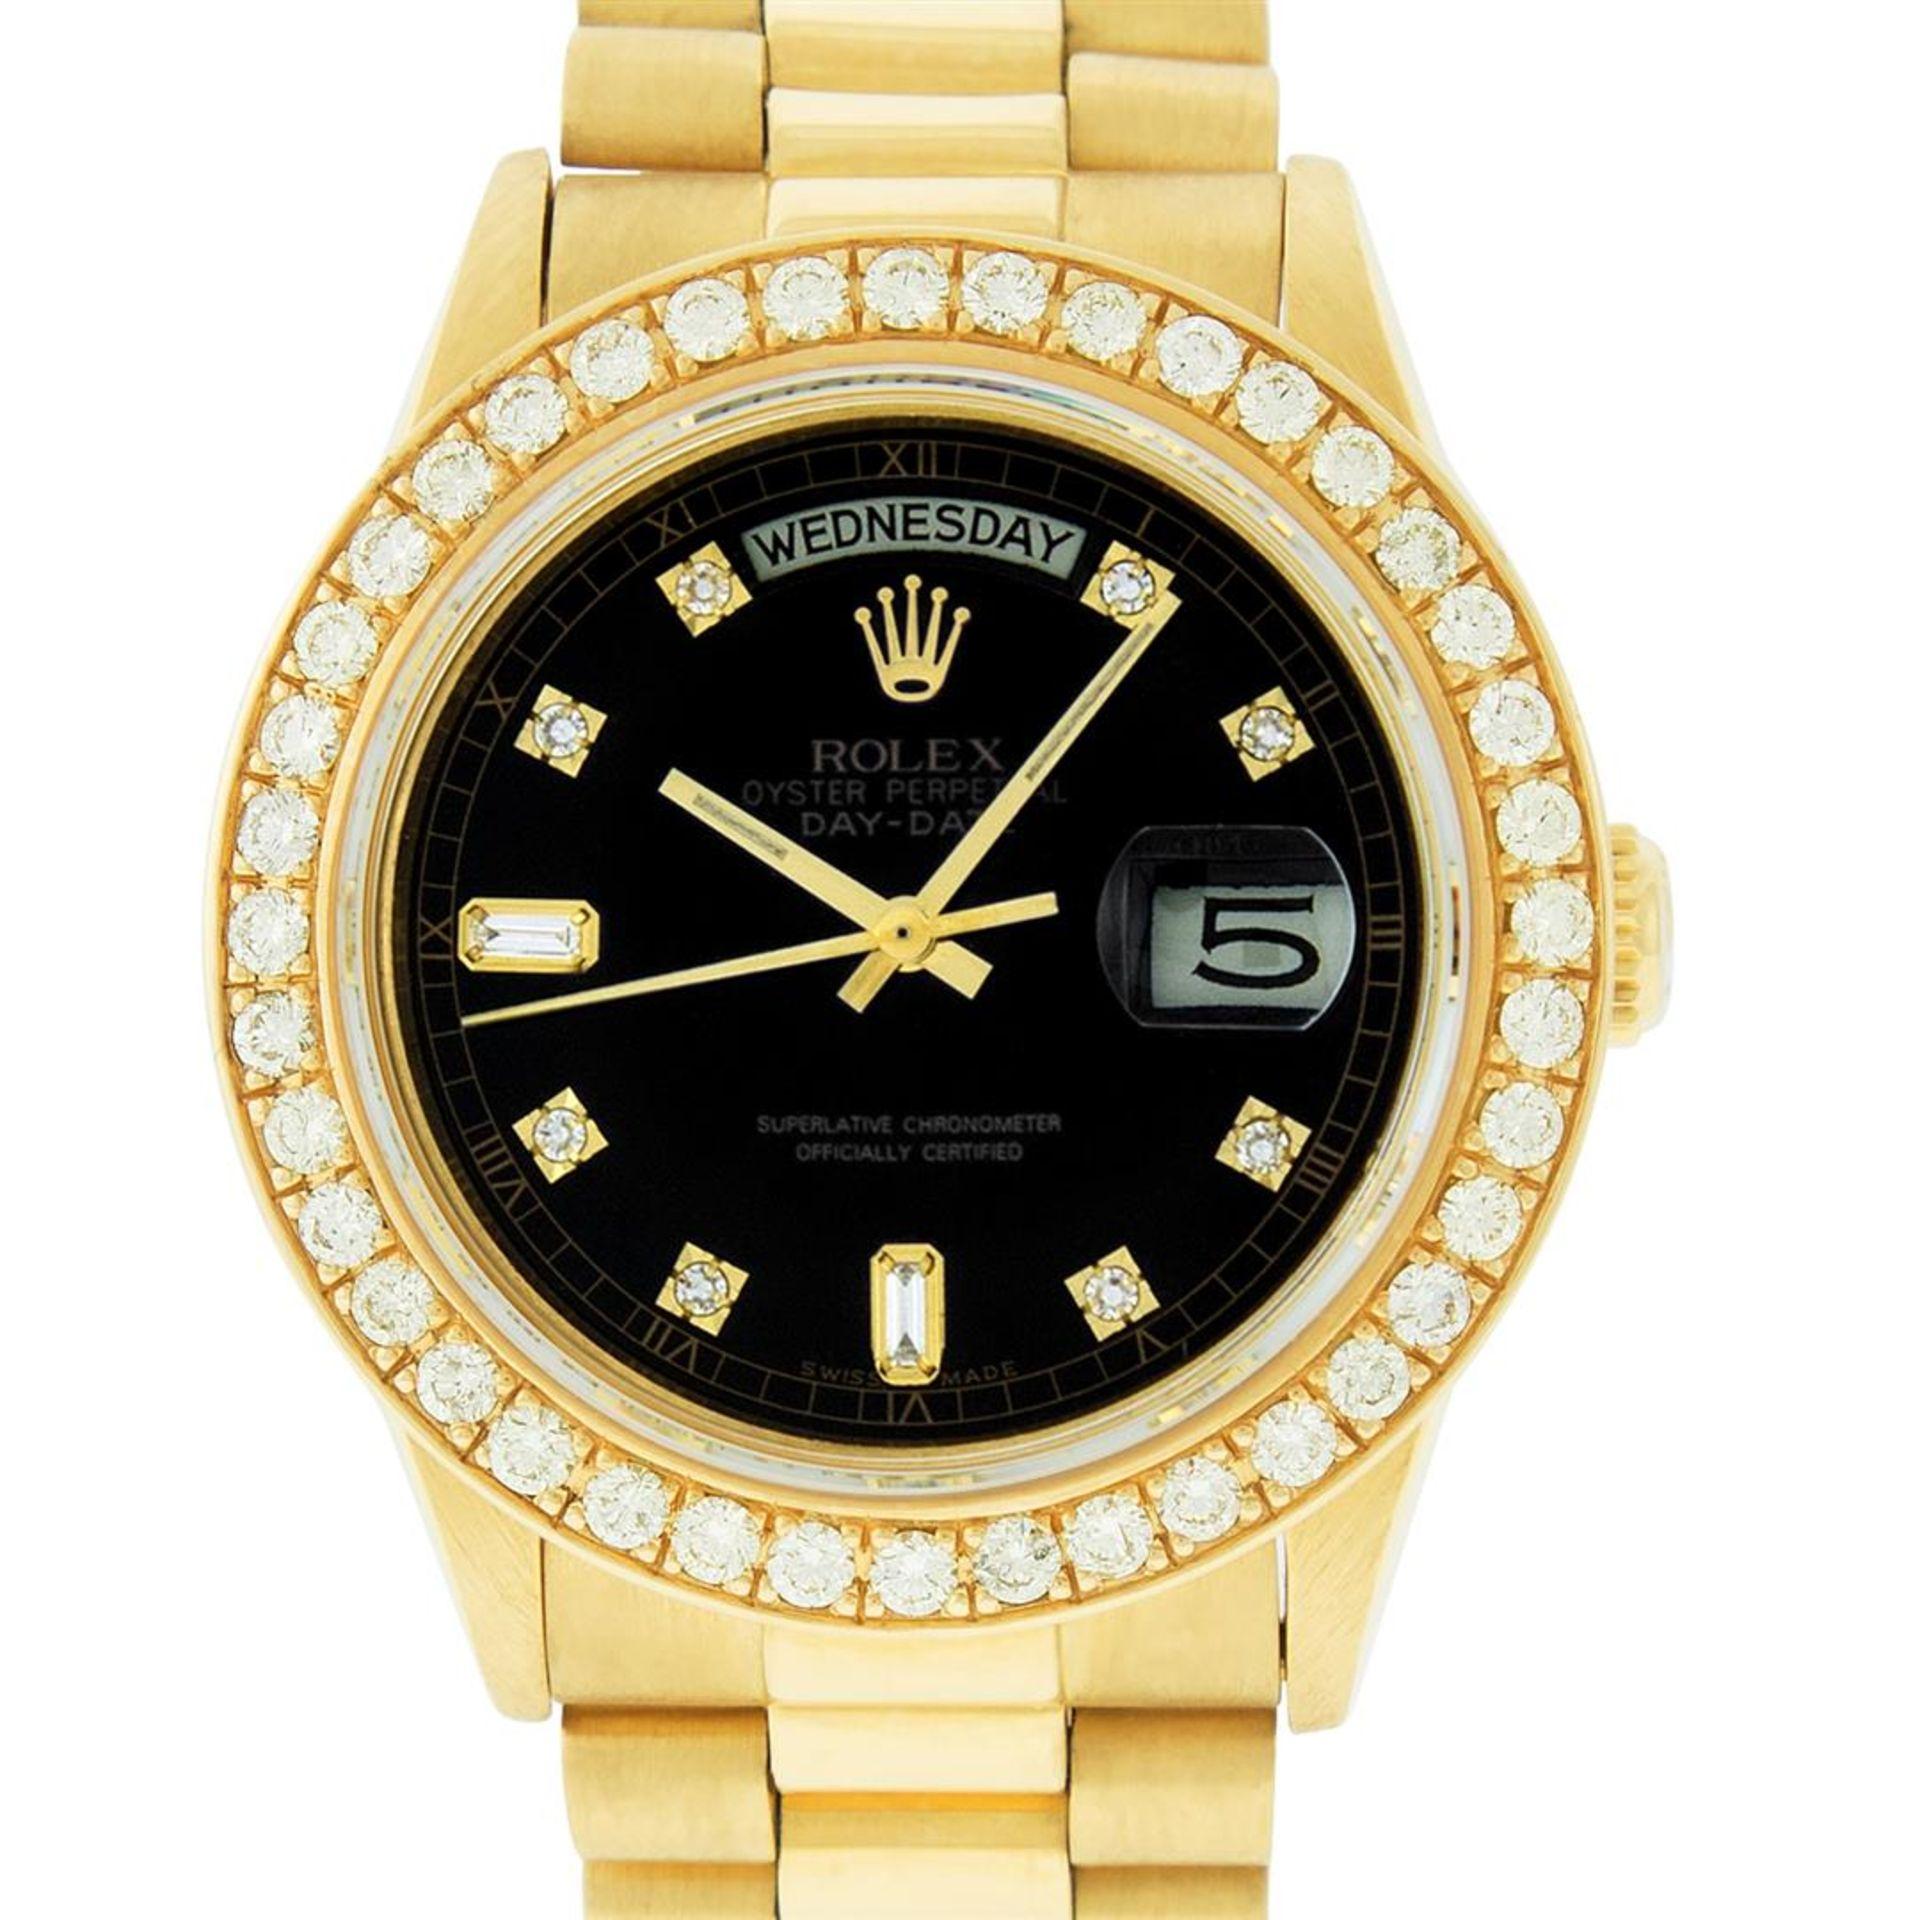 Rolex Mens 18K Yellow Gold Black Diamond 2.5 ctw Quickset President Wristwatch W